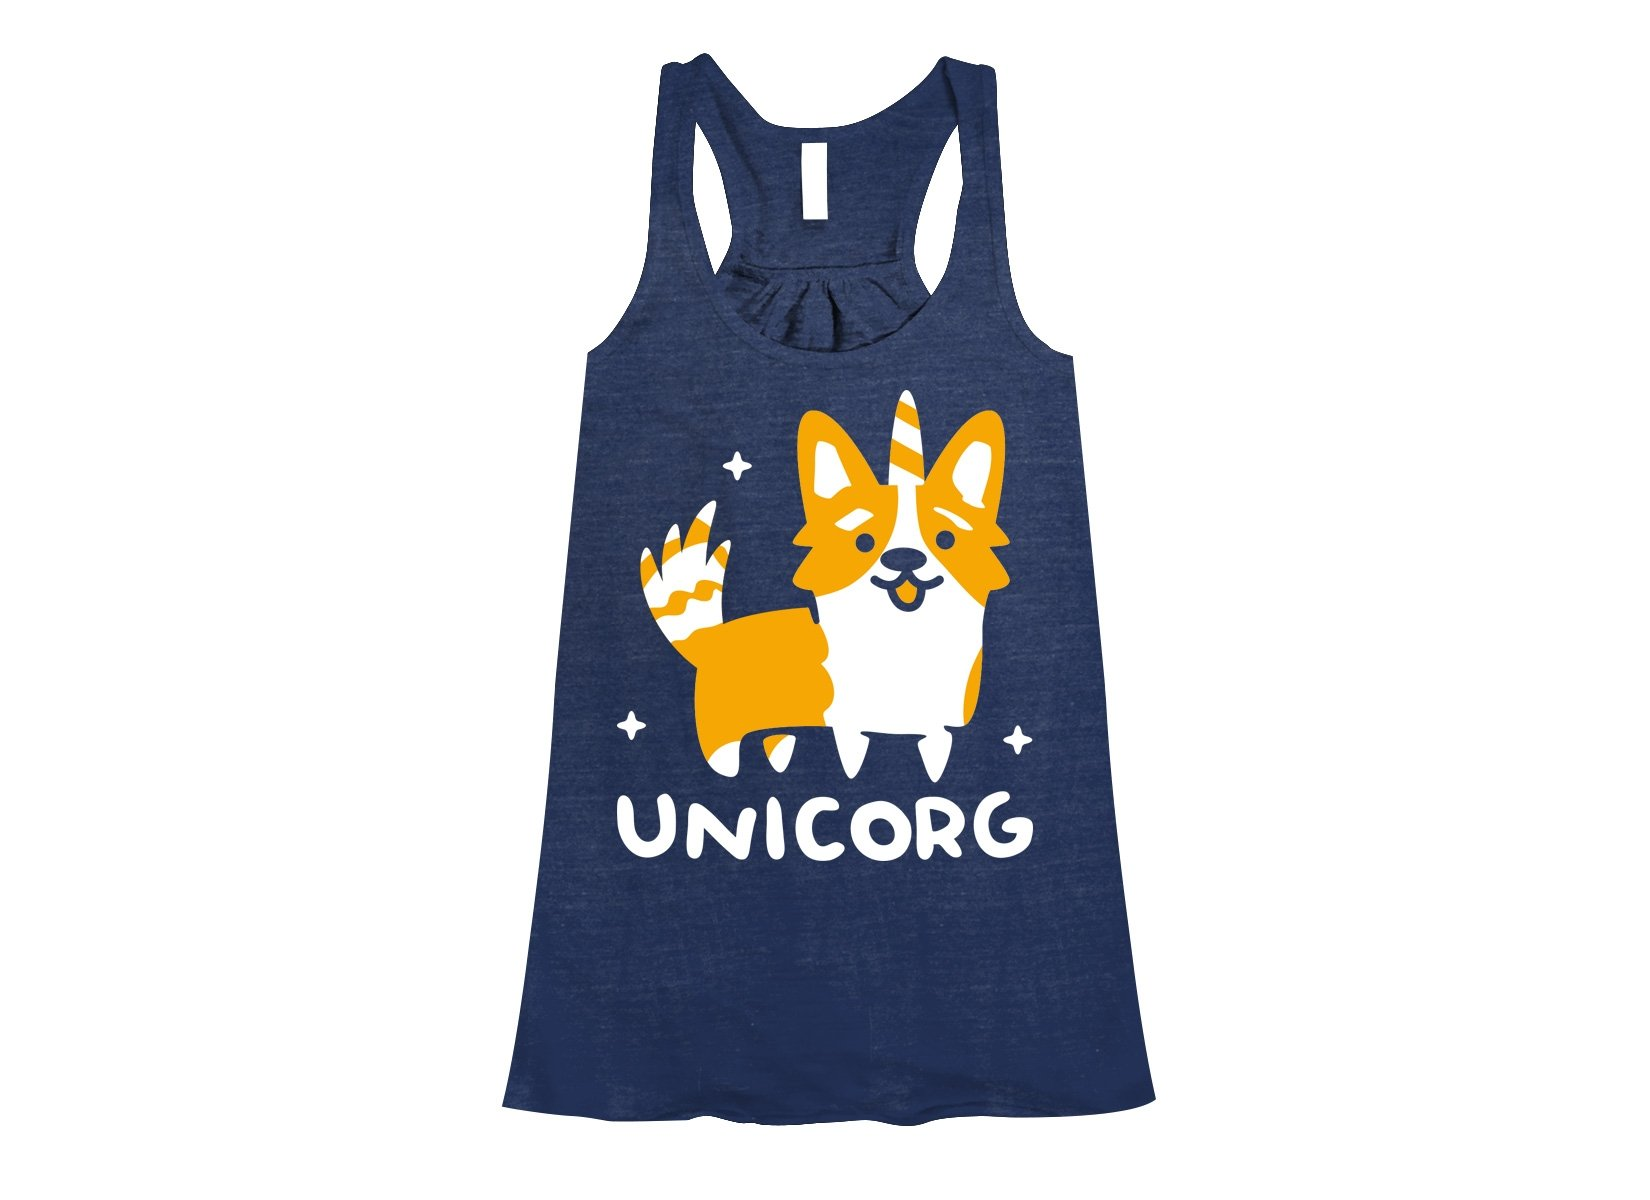 Unicorg on Womens Tanks T-Shirt